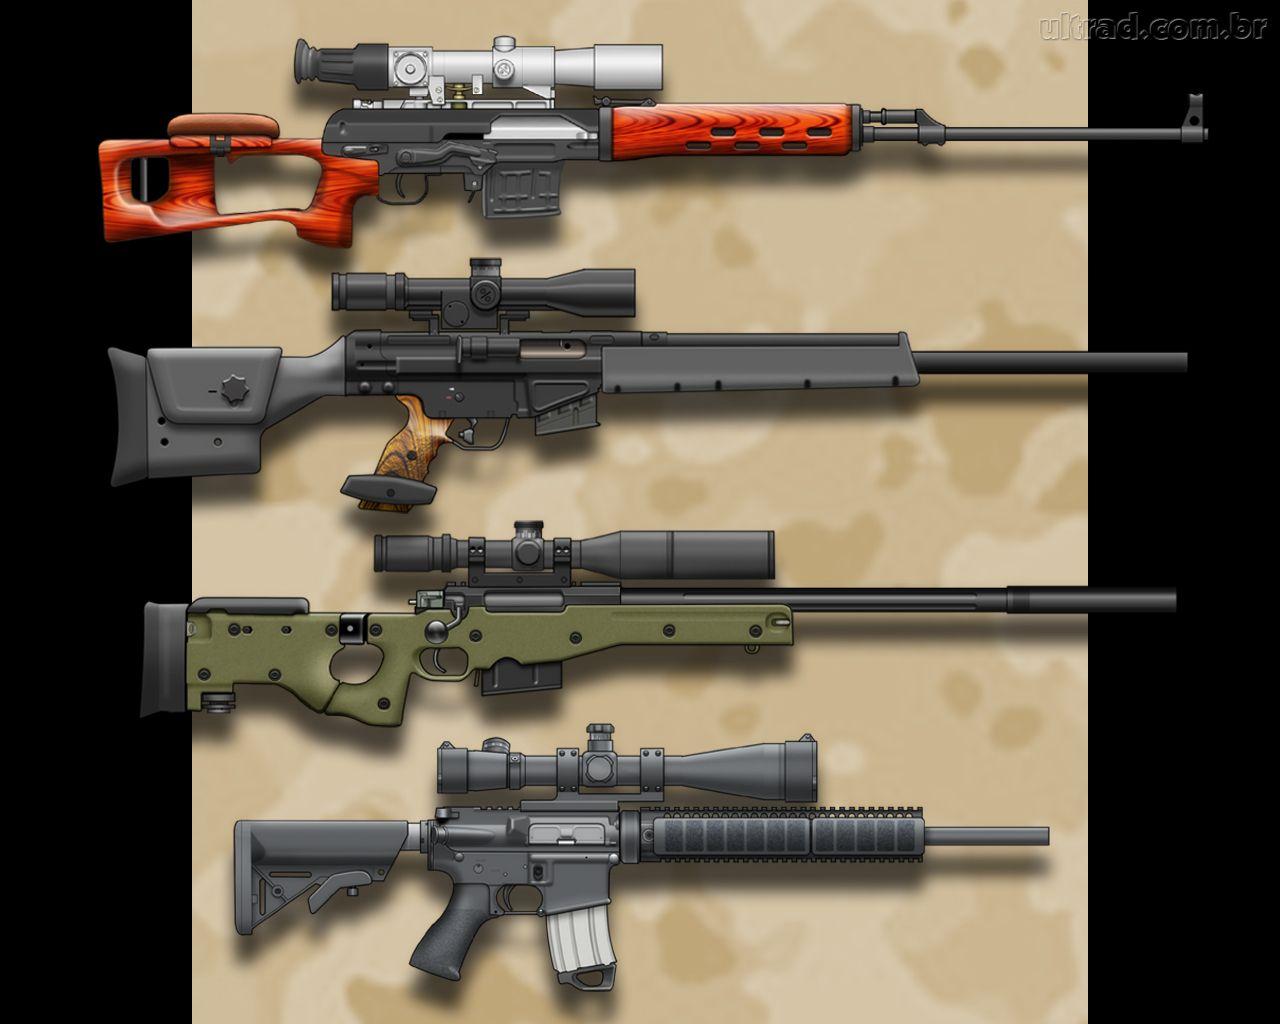 http://4.bp.blogspot.com/_rKdg6y39AVE/S7X7WCUcJxI/AAAAAAAAAZ0/oTtNn5y9NEE/s1600/233216_Papel-de-Parede-Armas-de-fogo_1280x1024%5B1%5D.jpg